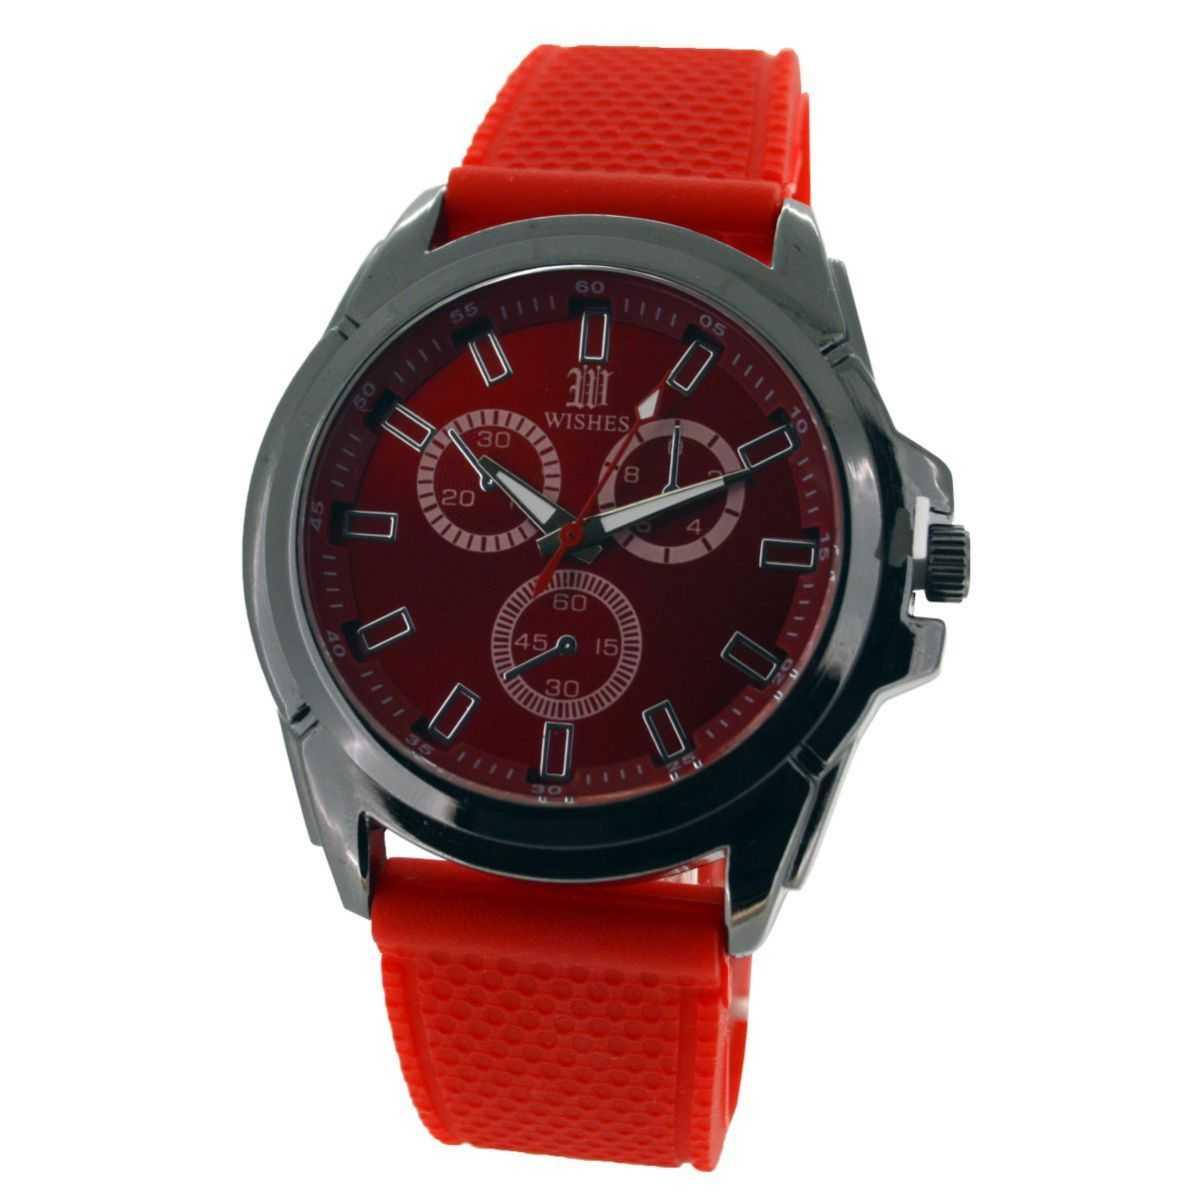 Relógio Personalizado 2462-6